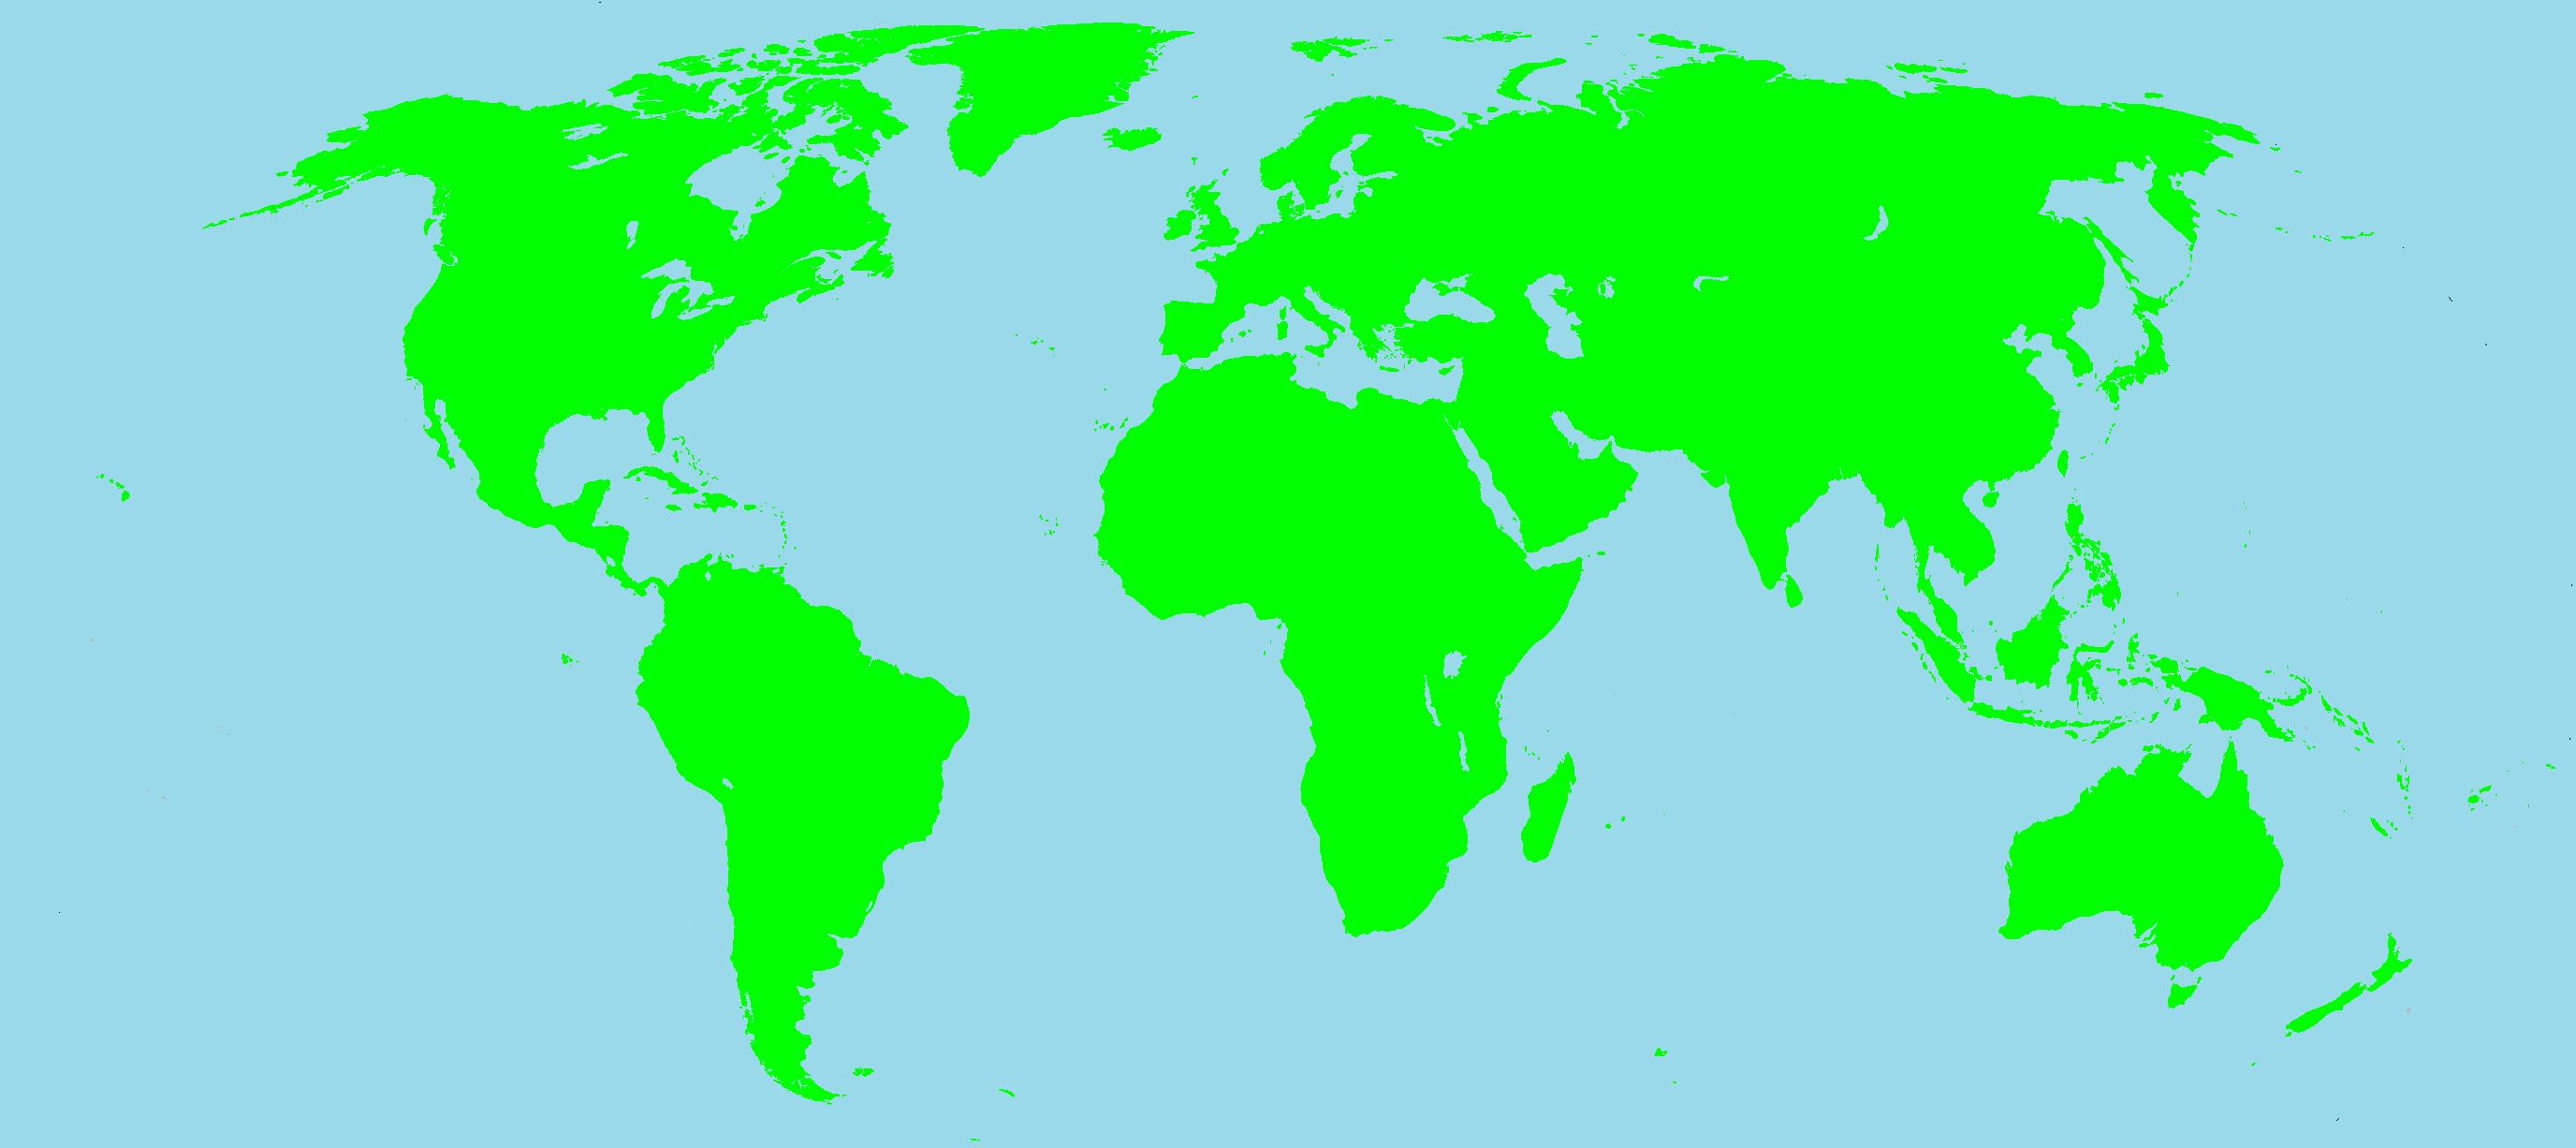 Blankmap World Large Noborders By Konigsritter D764jrw.png